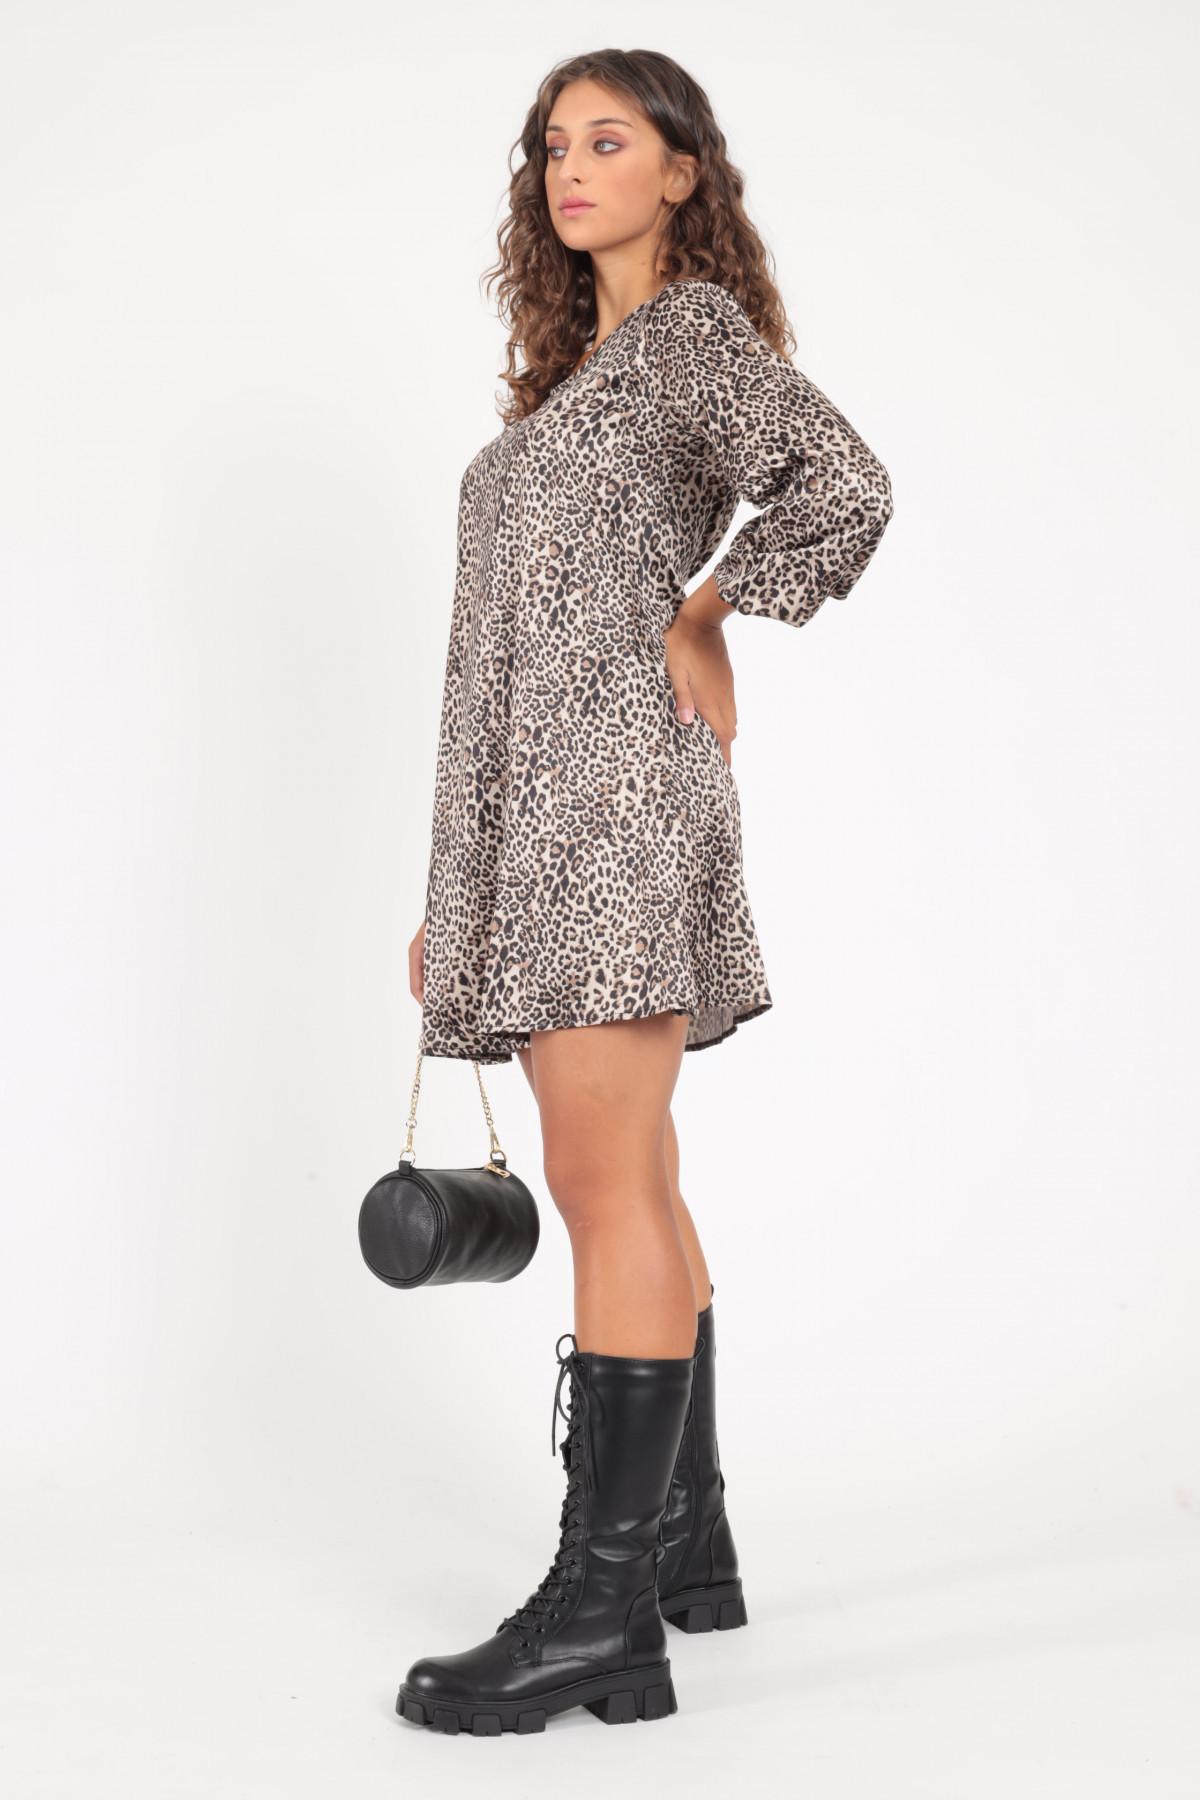 3/4 Sleeve Dress in Animalier Print